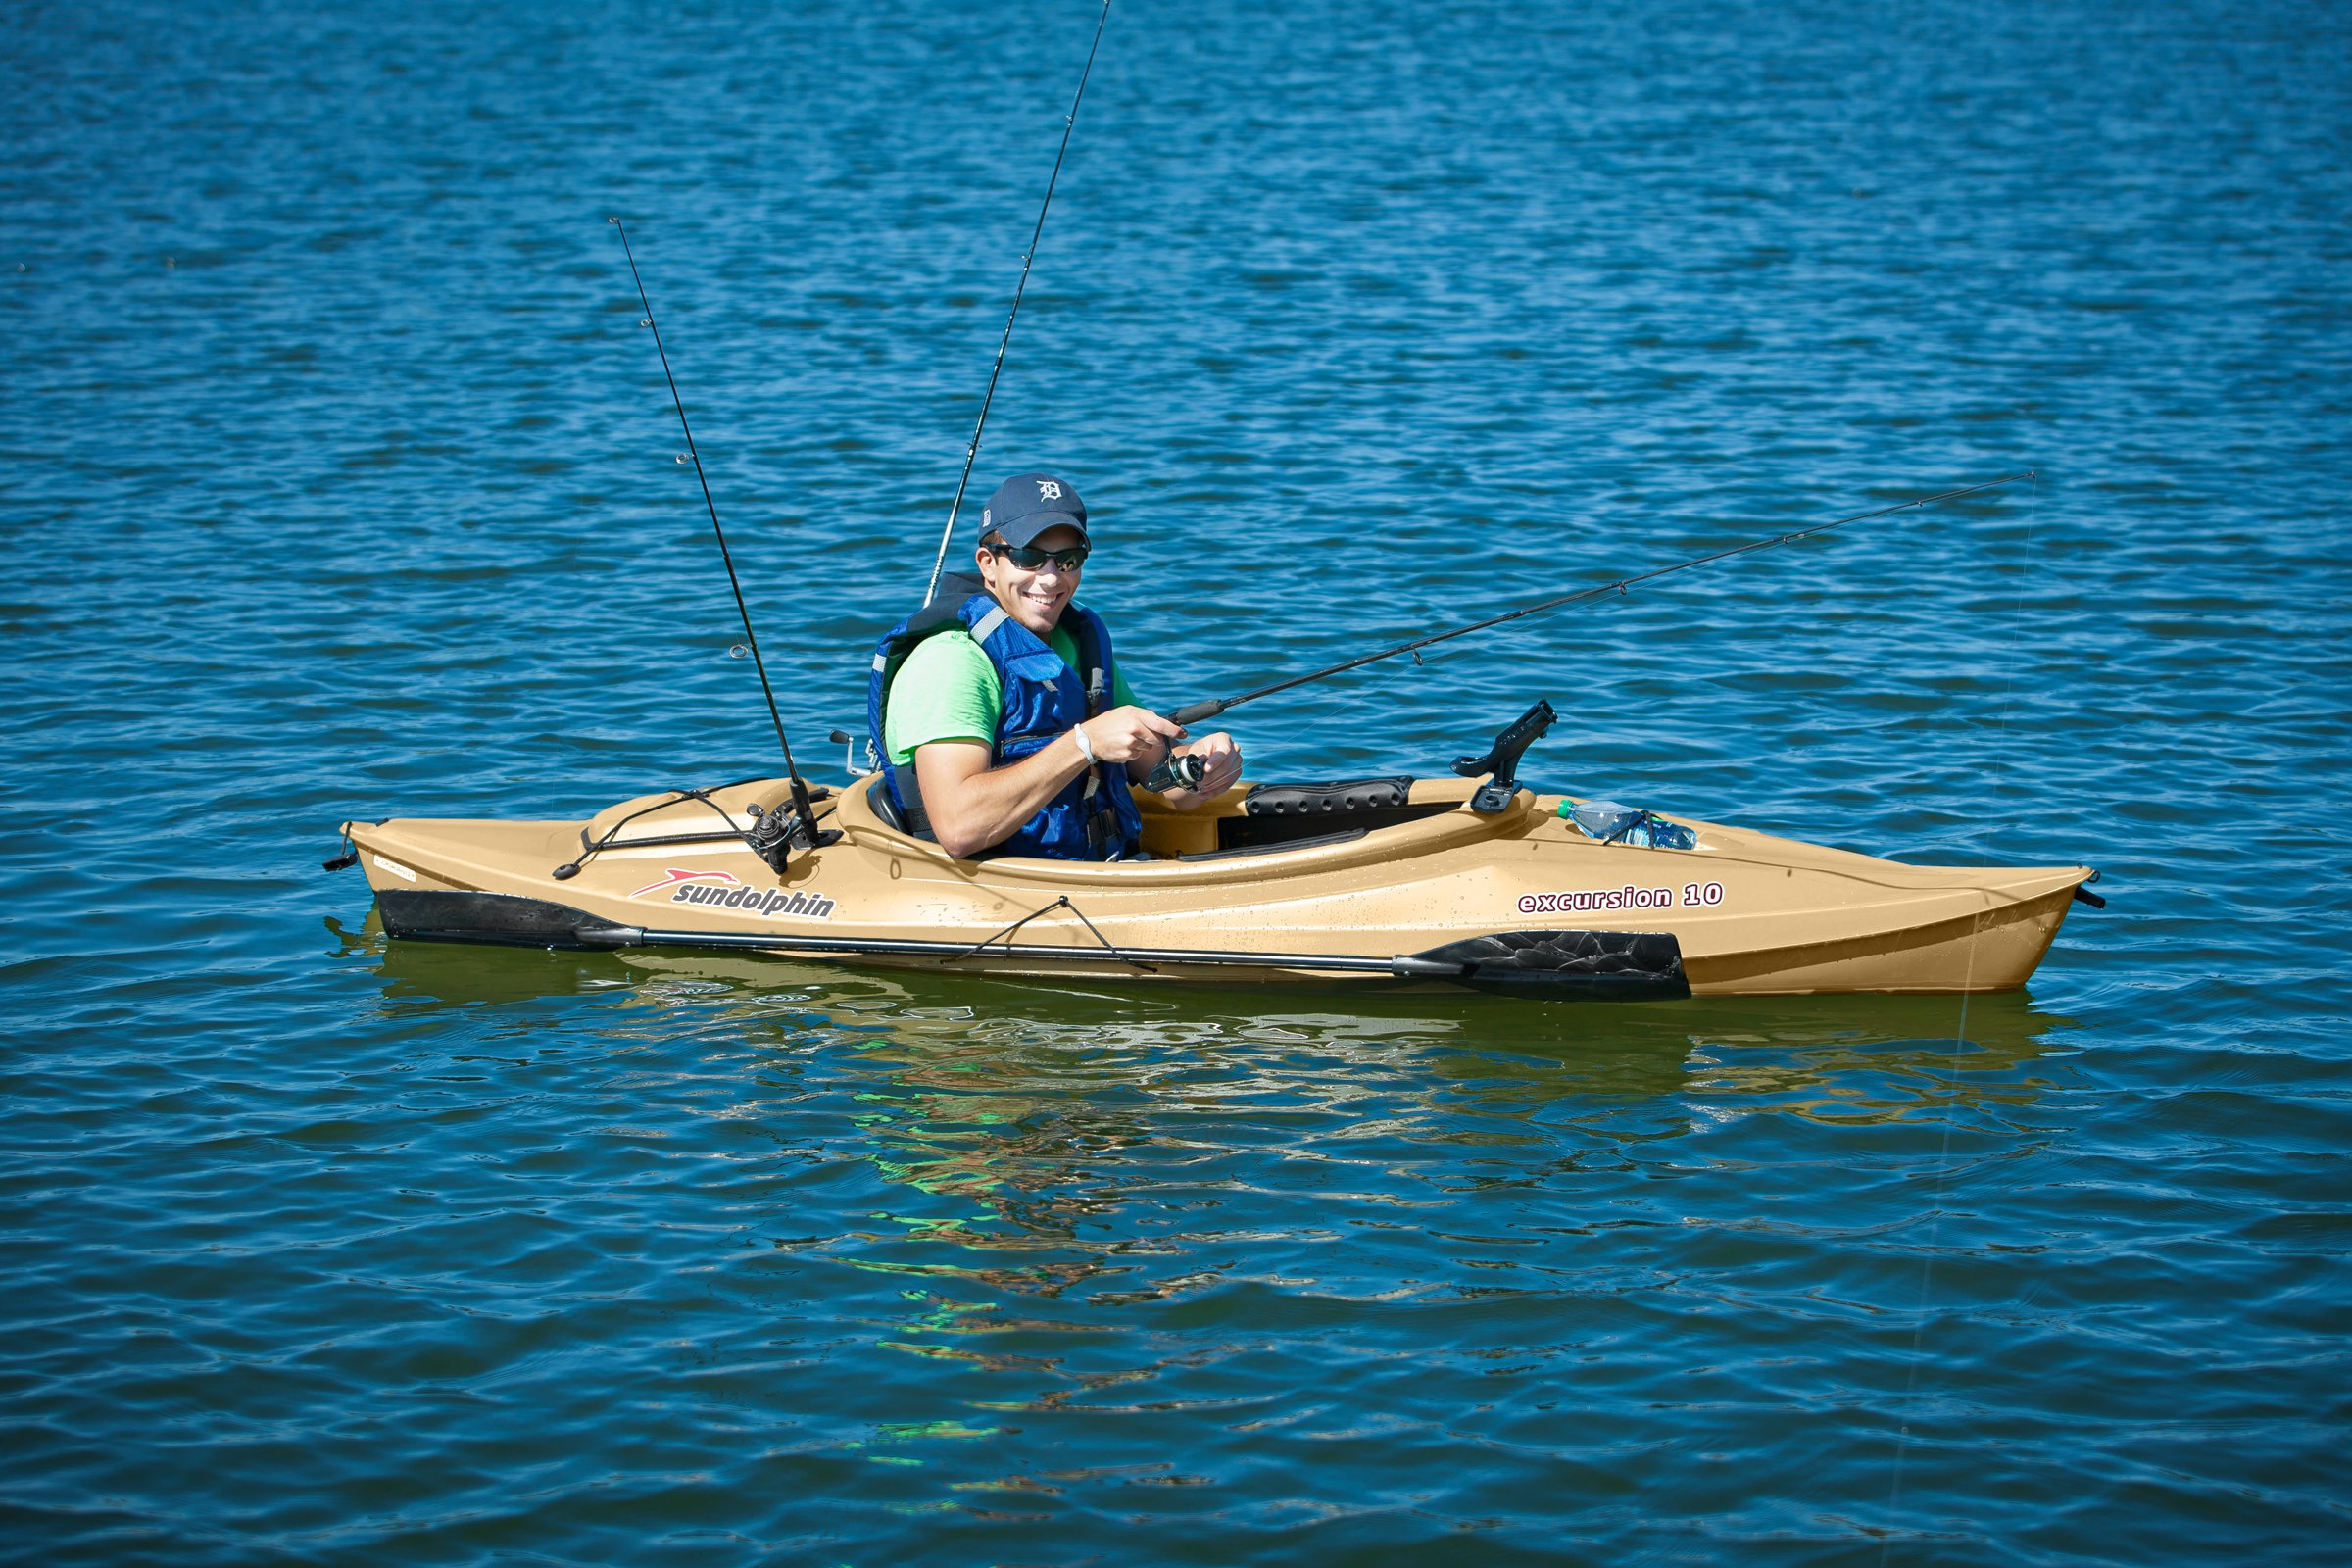 Sun Dolphin Excursion 10 Fishing Kayak Review 3